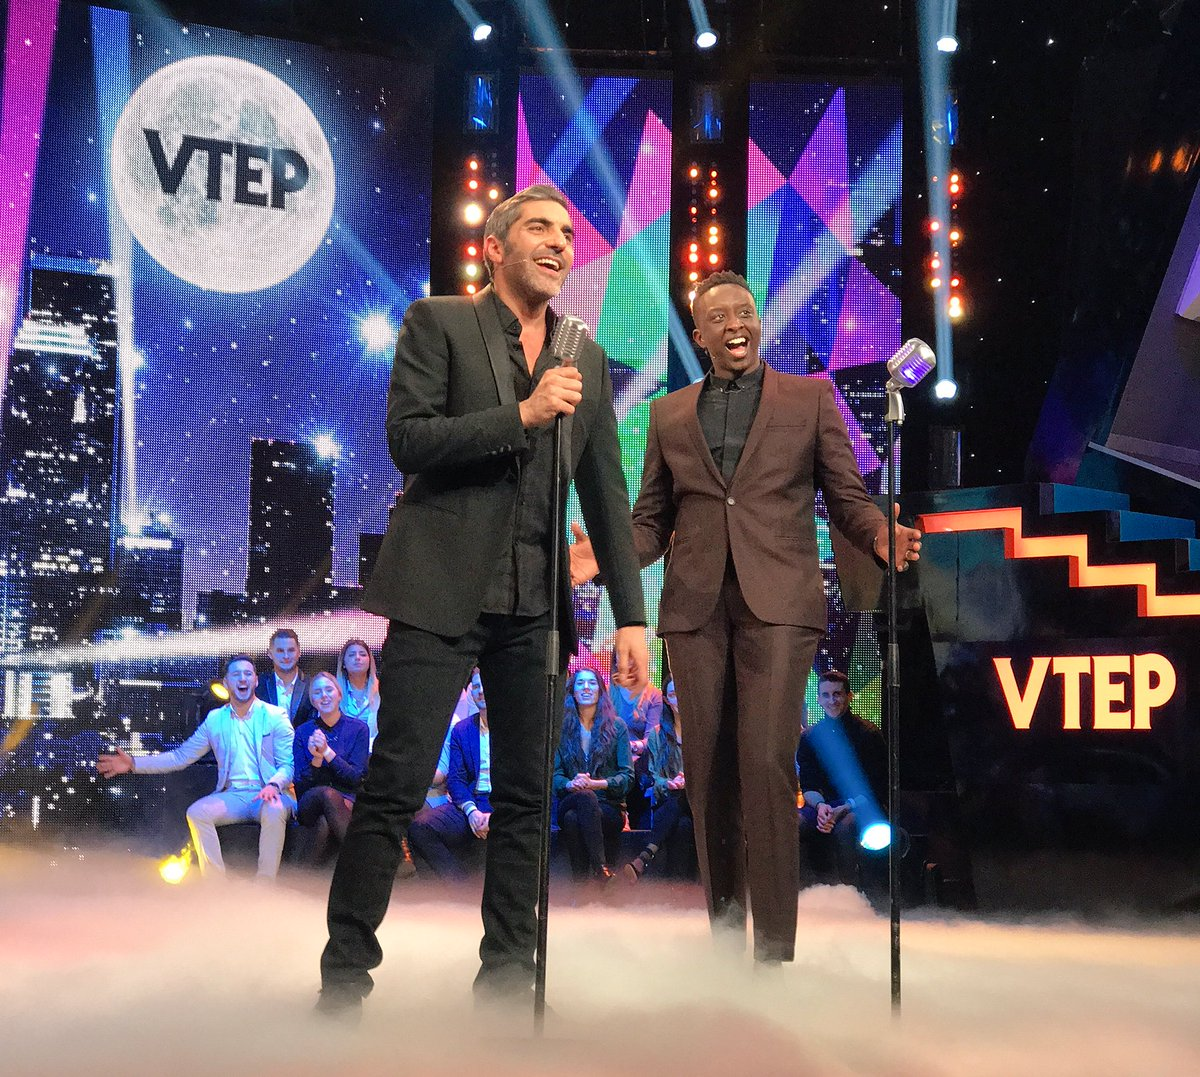 😂😂😂 @Ahmed_Sylla @guillaumecanet #DanyBoon #AryAbittan @TF1 #VTEP http...